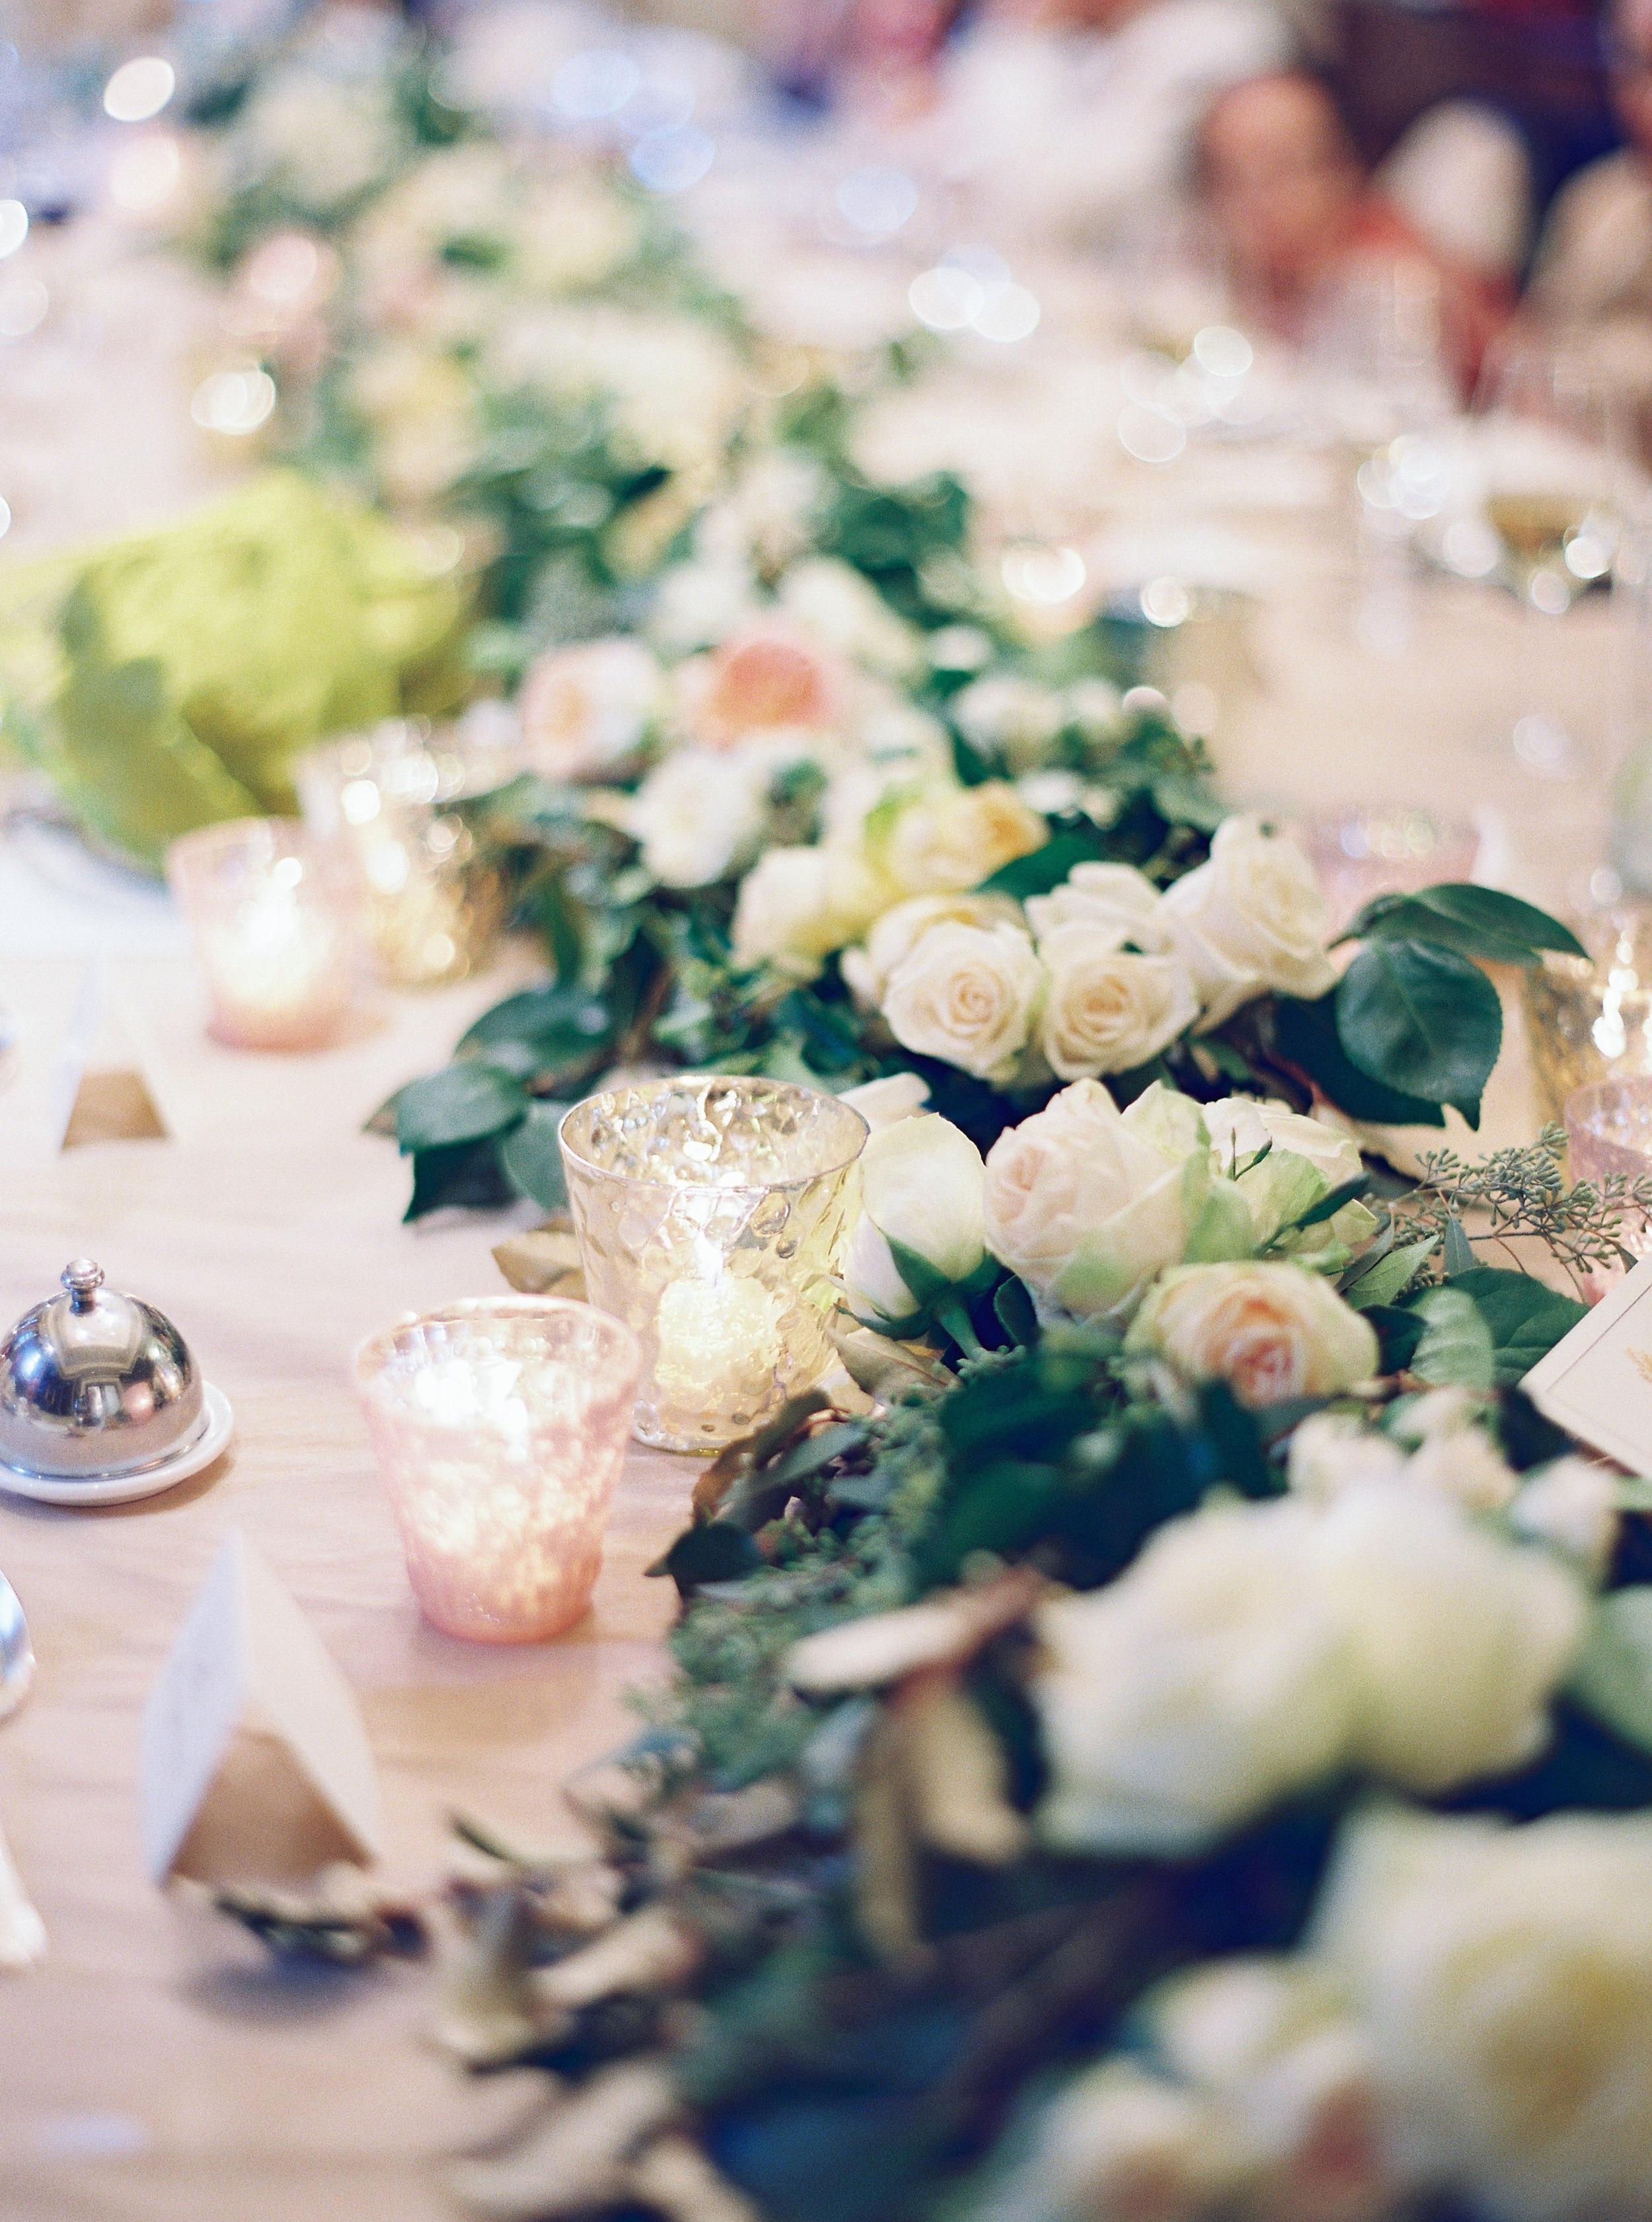 khurana_wedding00446.jpg